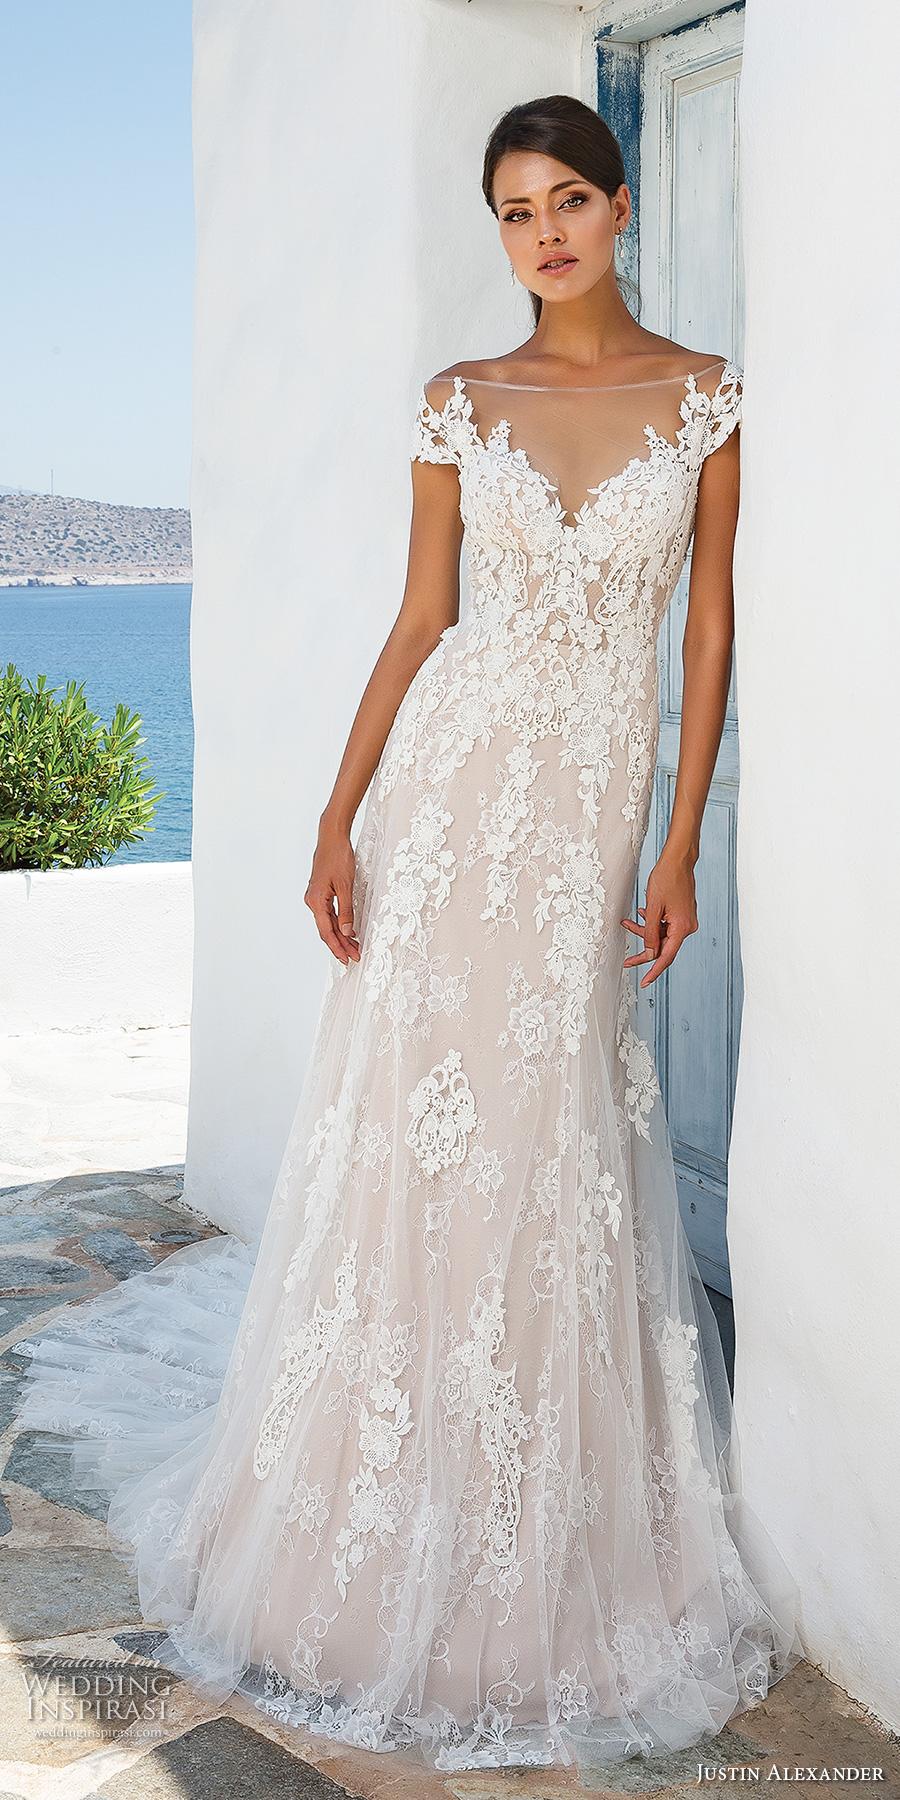 90698a273a4 justin alexander 2018 bridal cap sleeves illusion off the shoulder sweetheart  neckline full embellishment romantic elegant